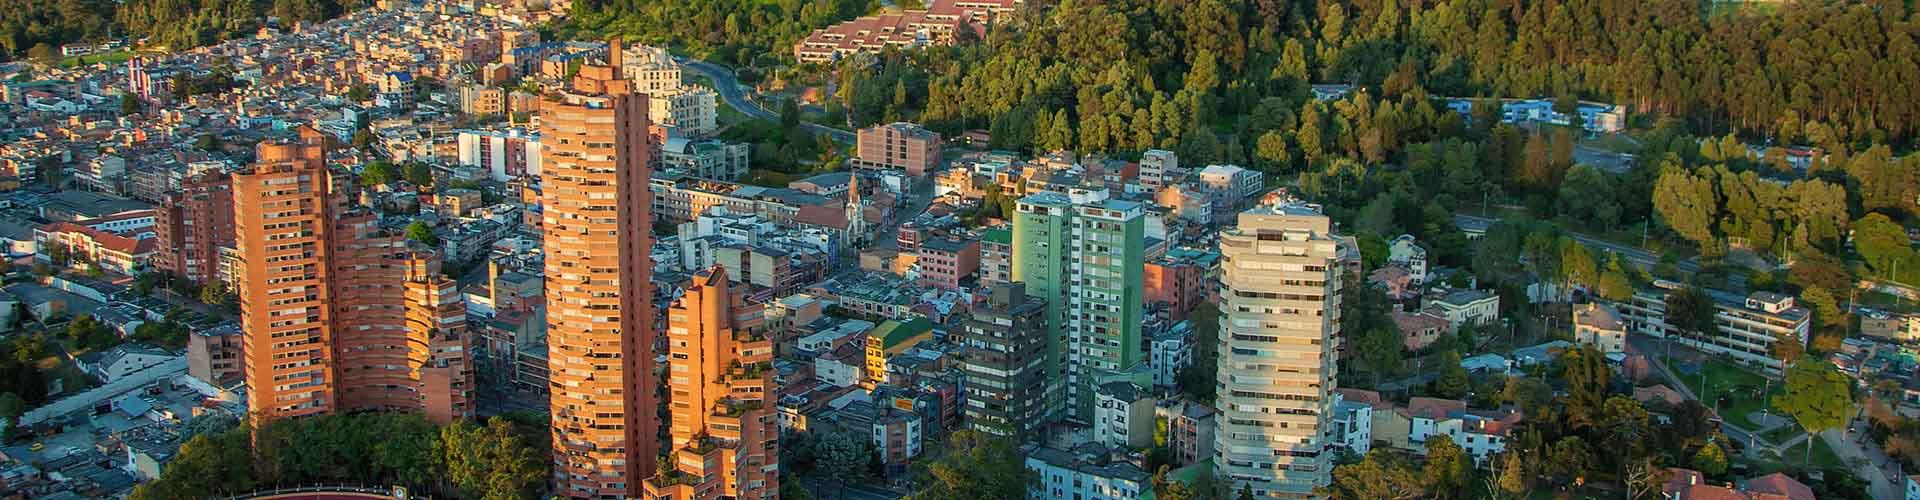 Bogota - Camping dans le quartier de San Ignacio. Cartes pour Bogota, photos et commentaires pour chaque camping à Bogota.